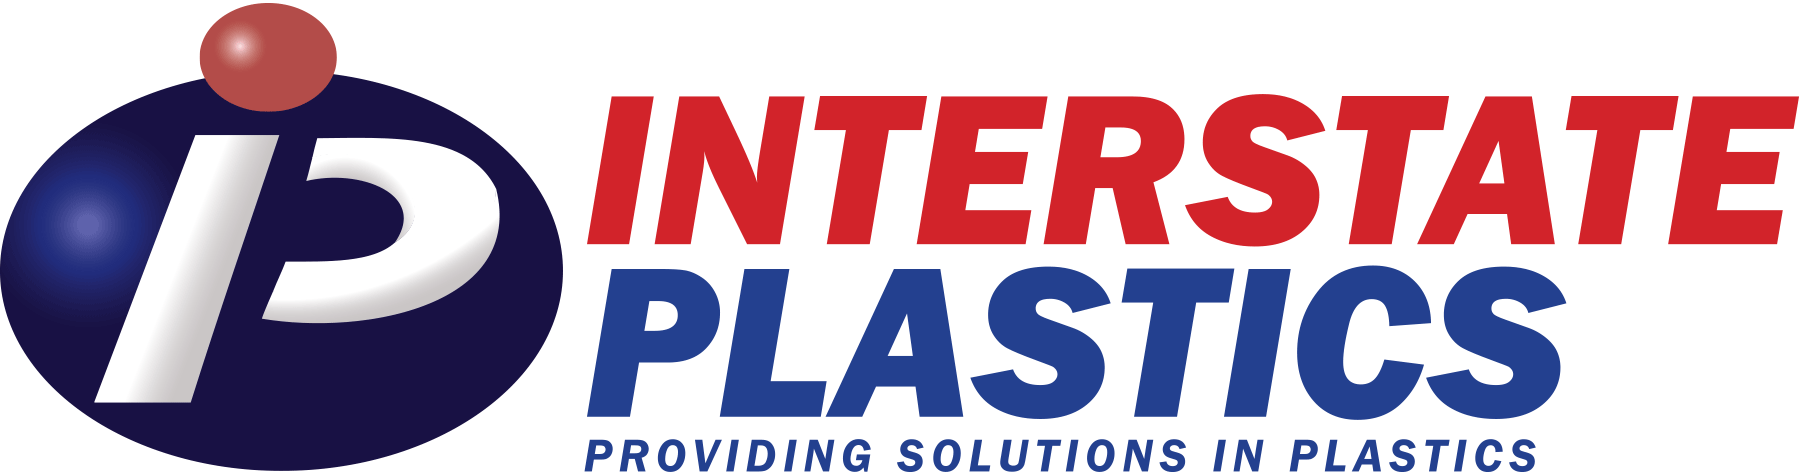 Interstate Plastics.png